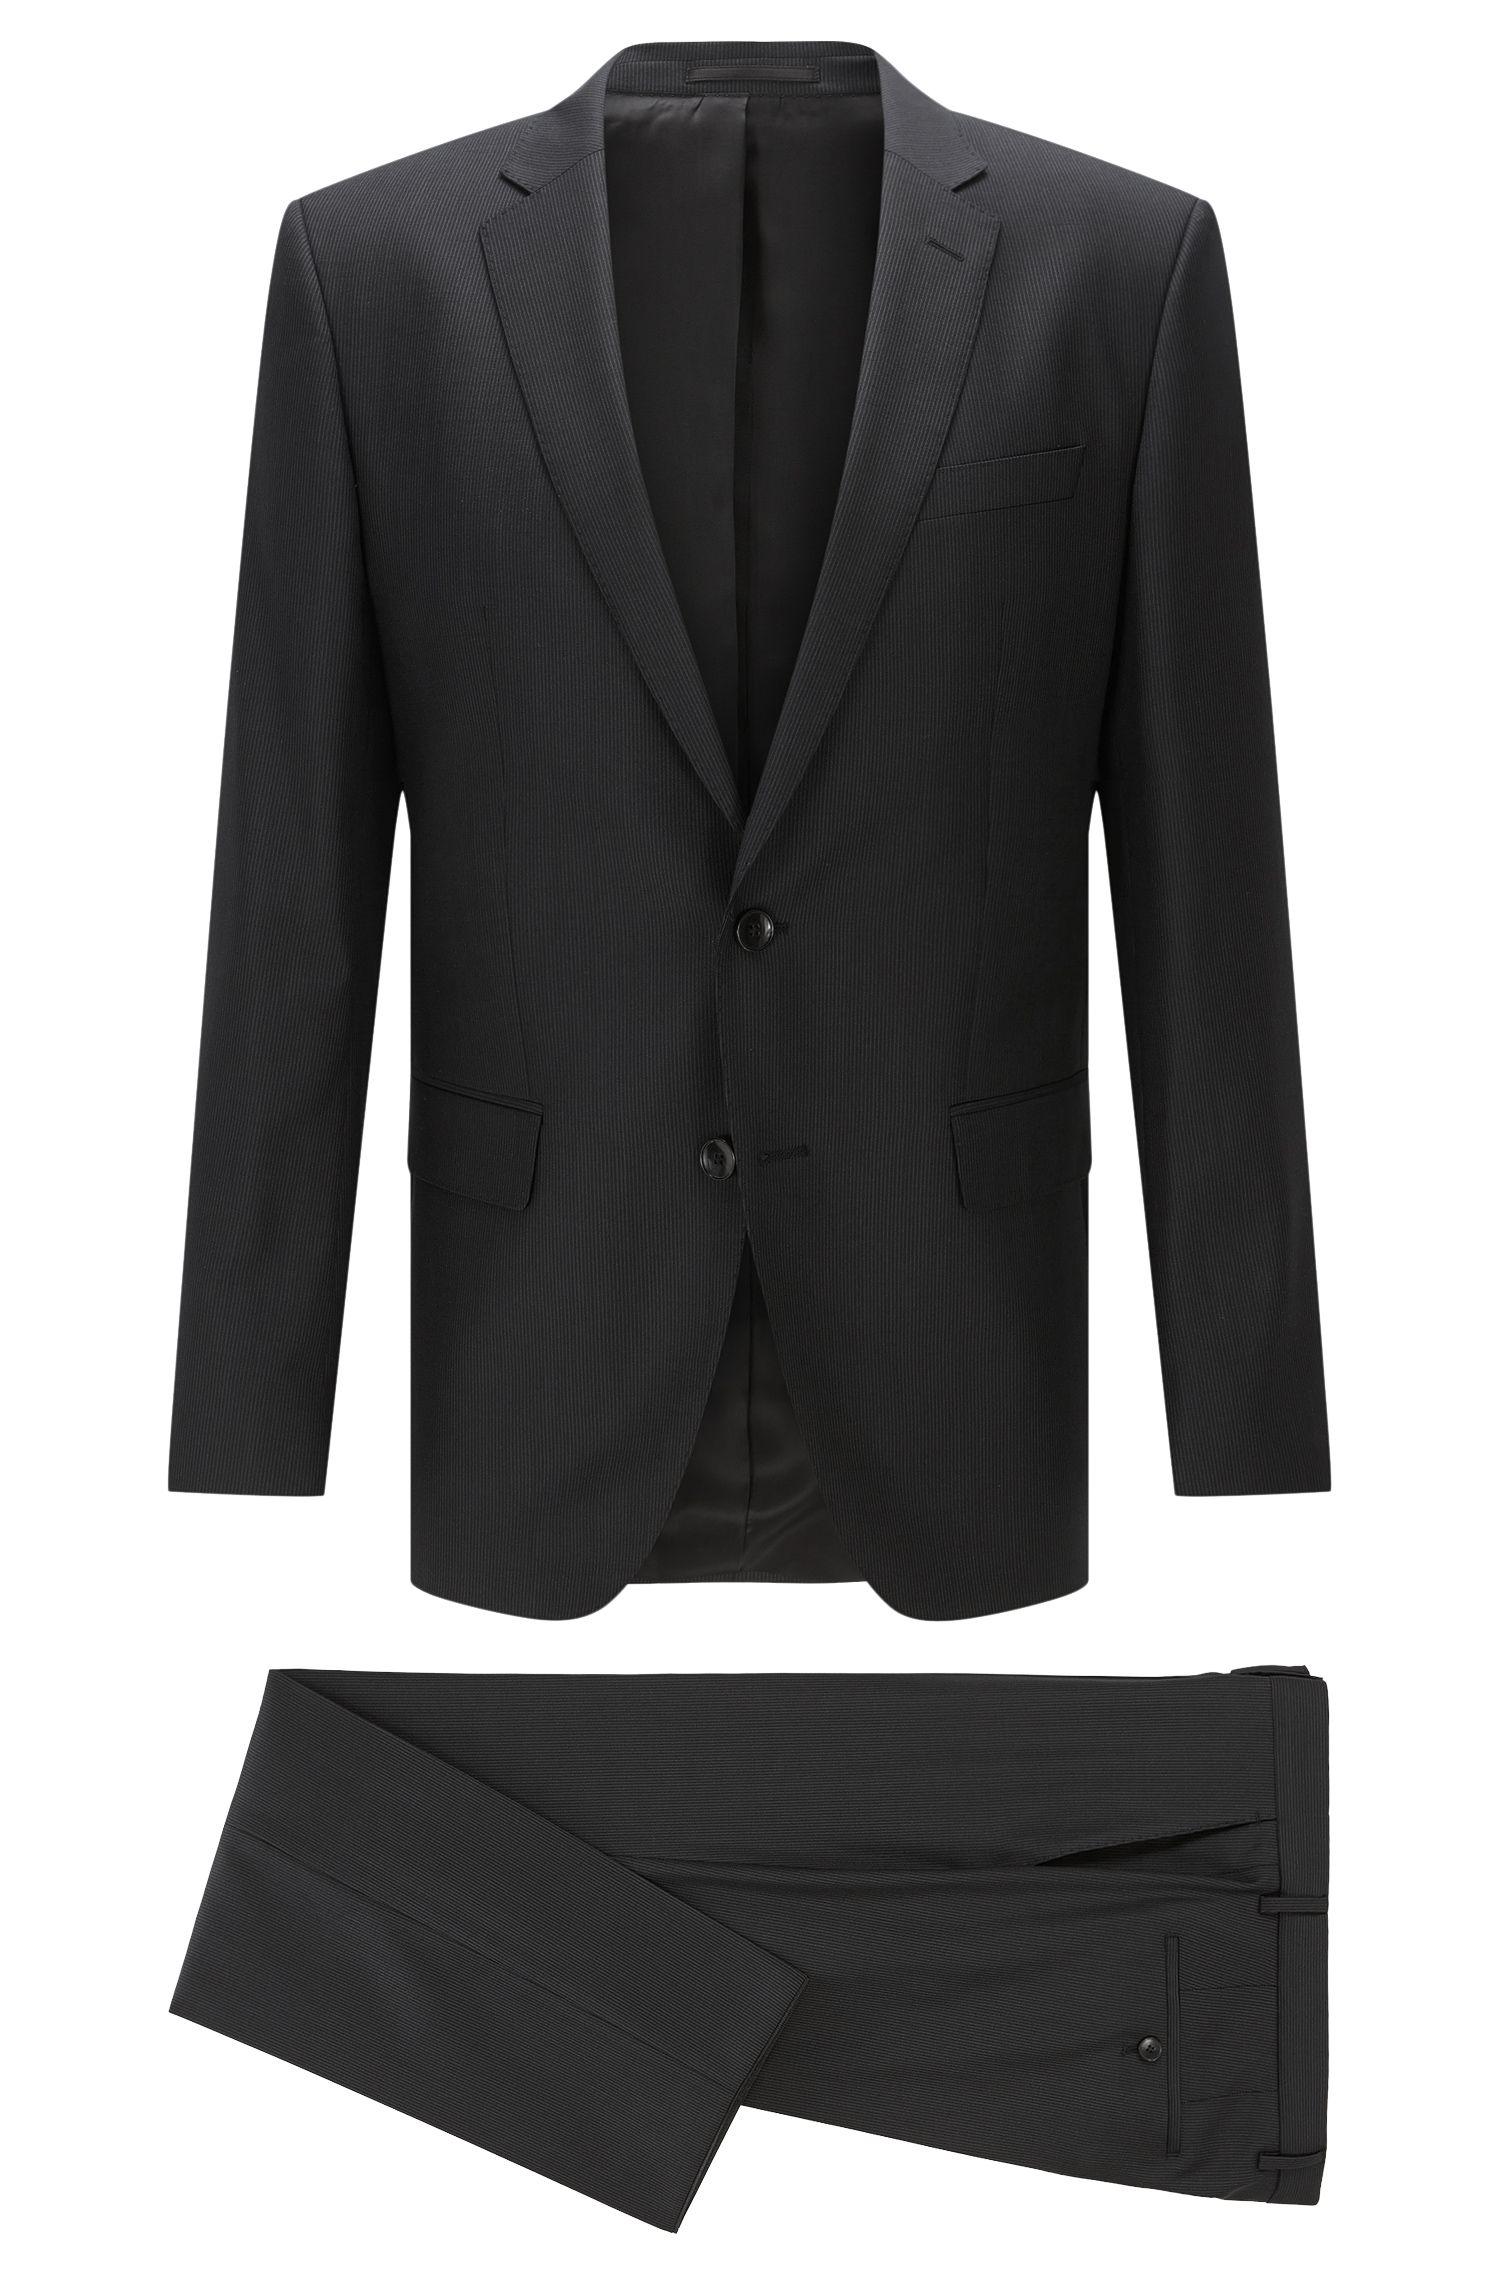 Tonal Striped Italian Super 110 Virgin Wool Suit, Slim Fit   Huge/Genius